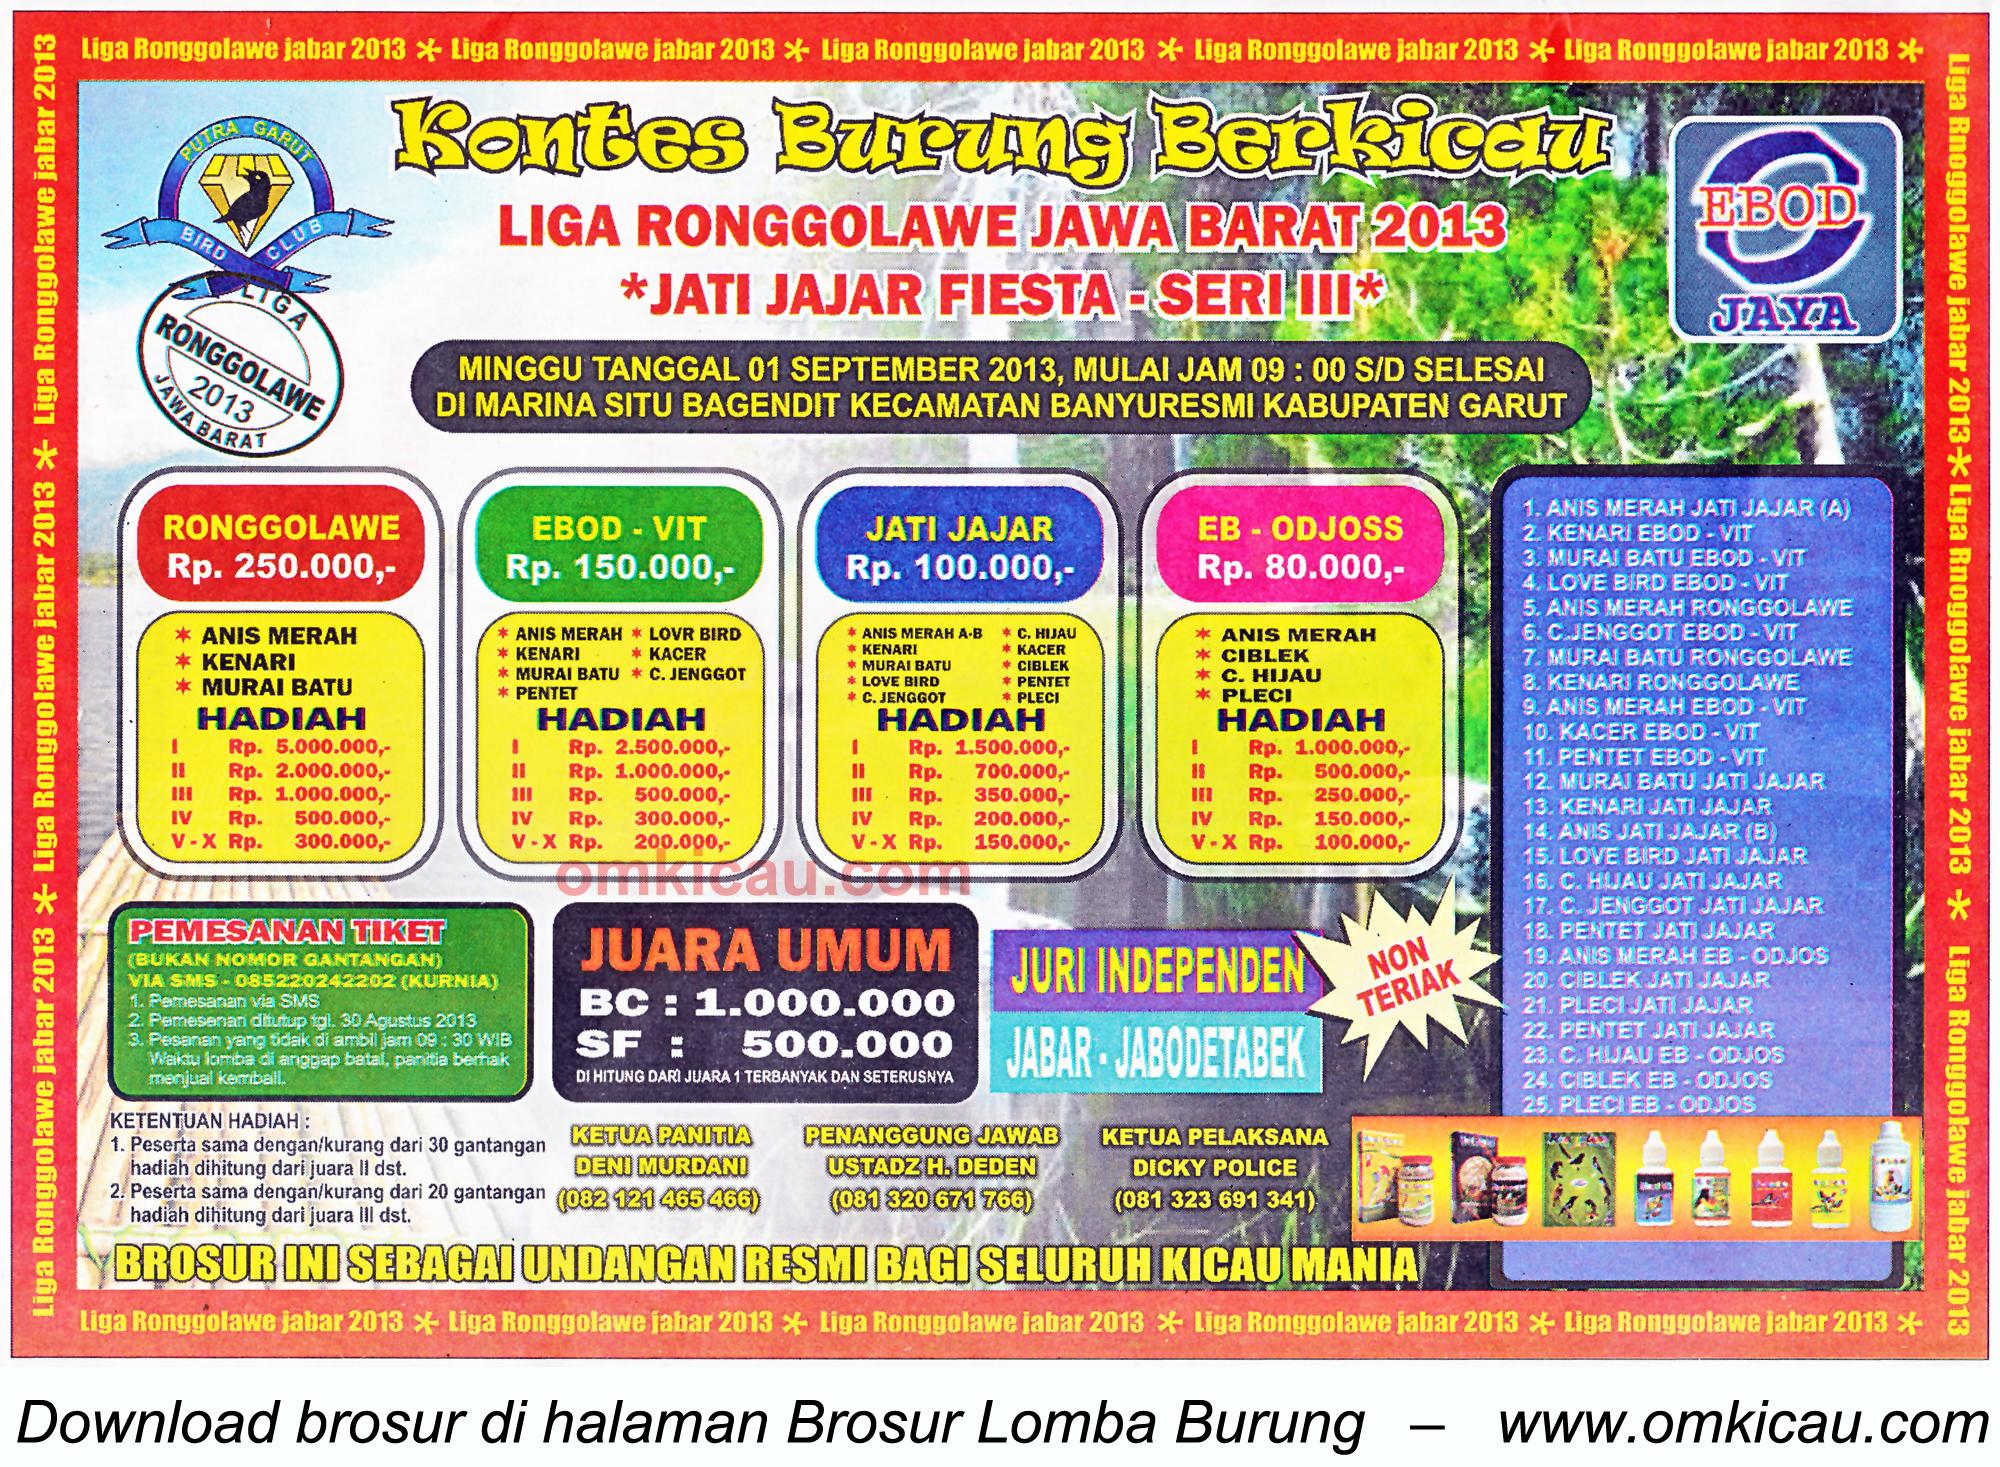 Brosur Lomba Burung Jatijajar Fiesta - LRJ 3 Garut 1 Sept 2013